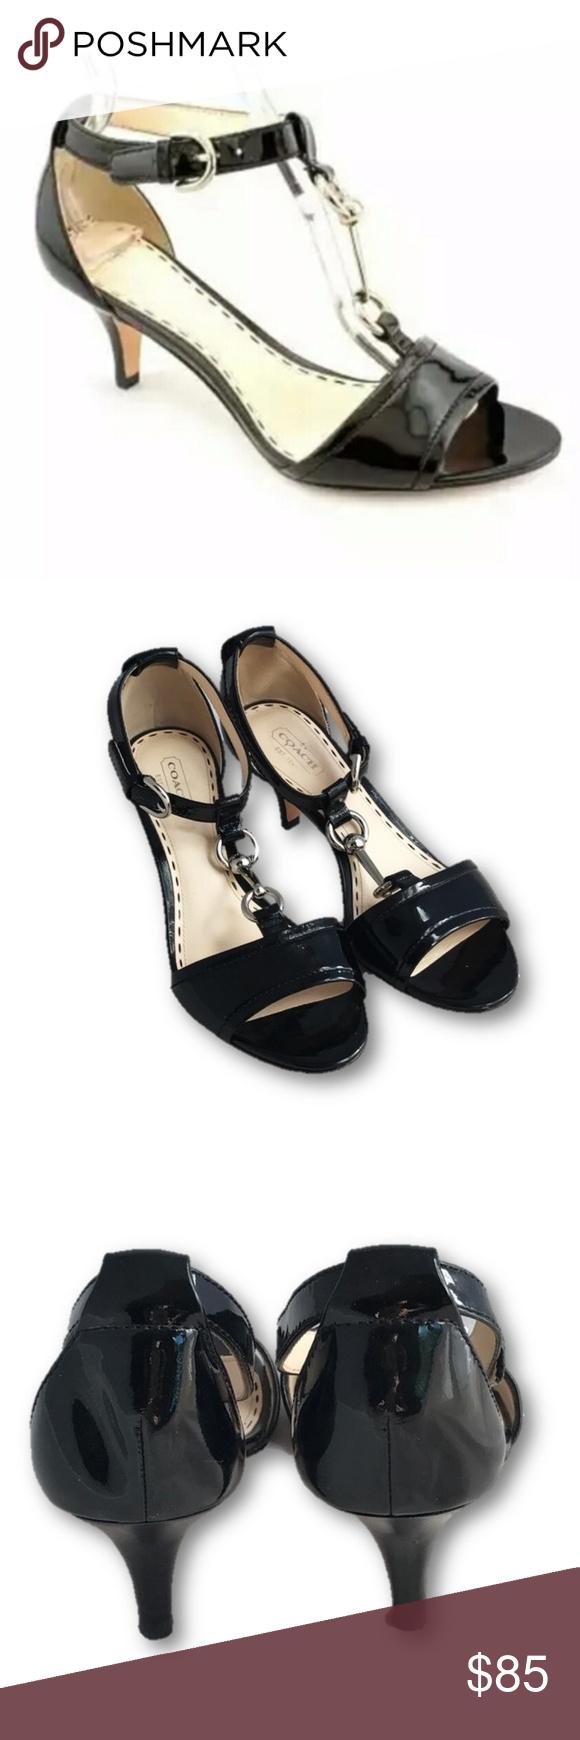 54b8dcc2447 Coach Black Patent Leather Inez kitten heel pump featuring peep toe Silver  Hardware Accent. 2.5